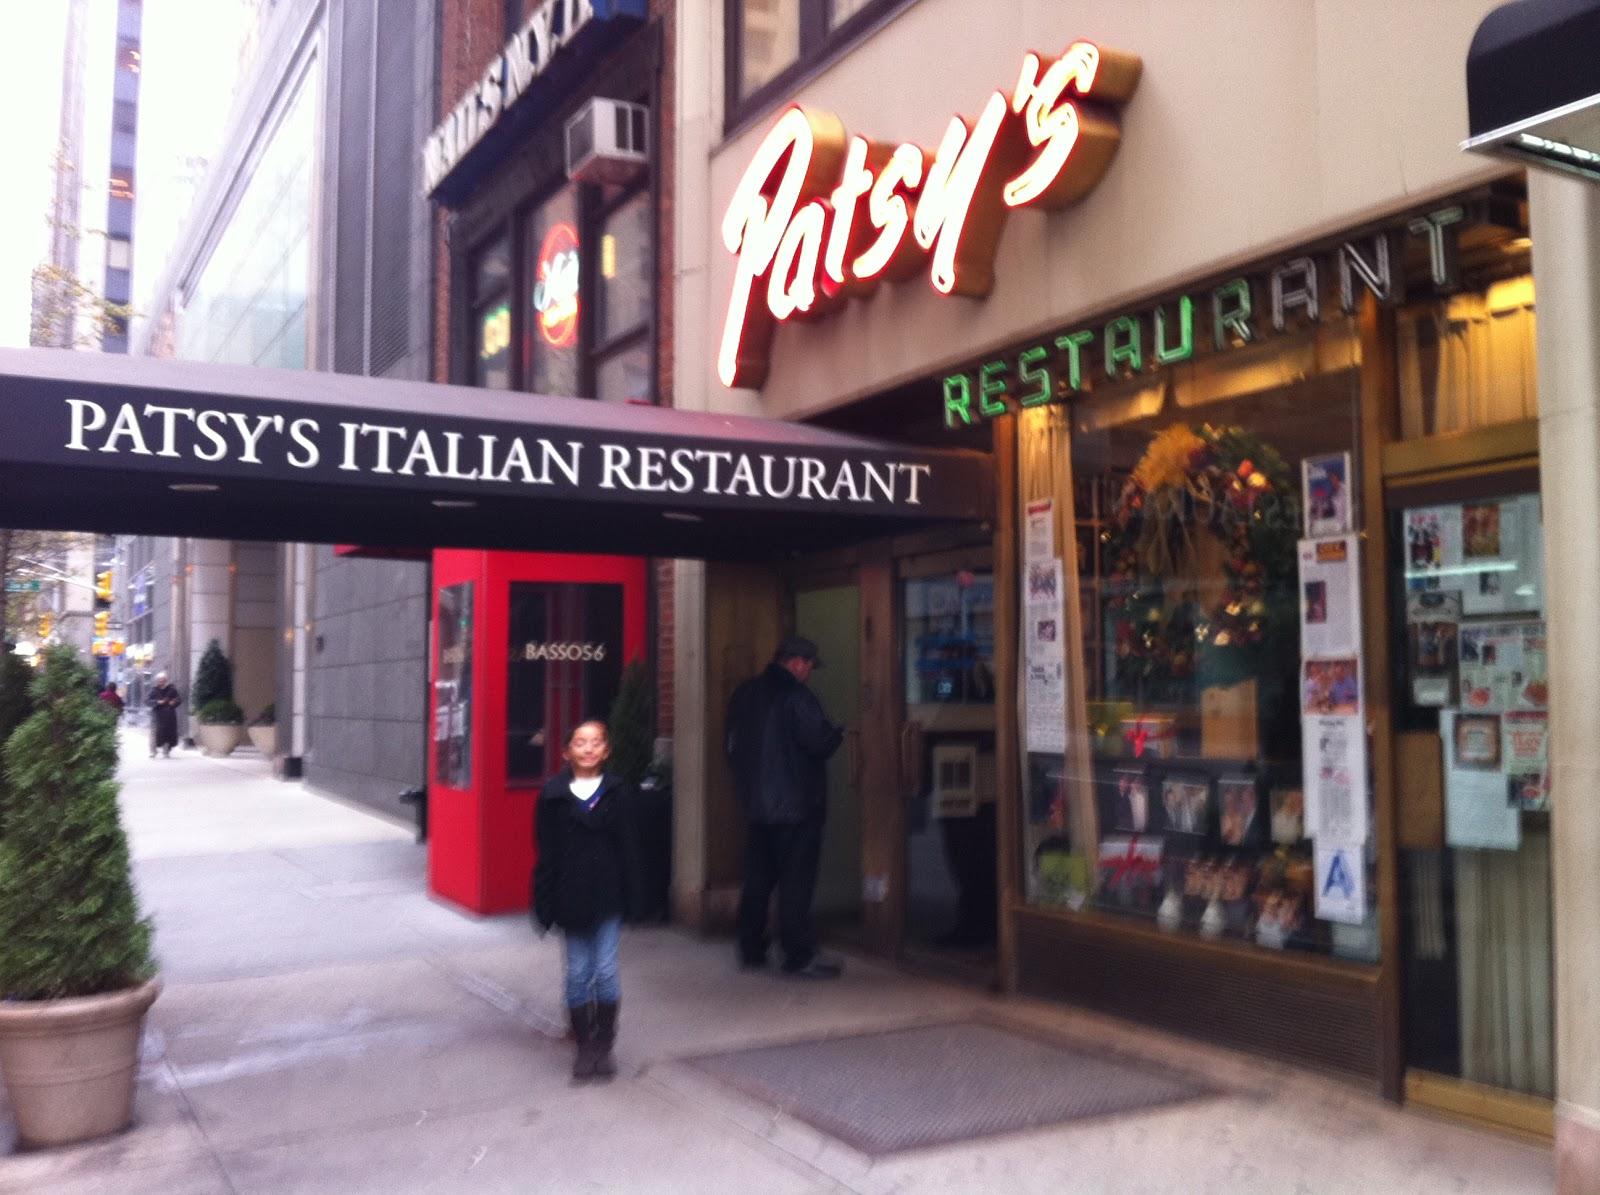 Italian Restaurants In Nyc: TASTE OF HAWAII: PATSY'S ITALIAN RESTAURANT